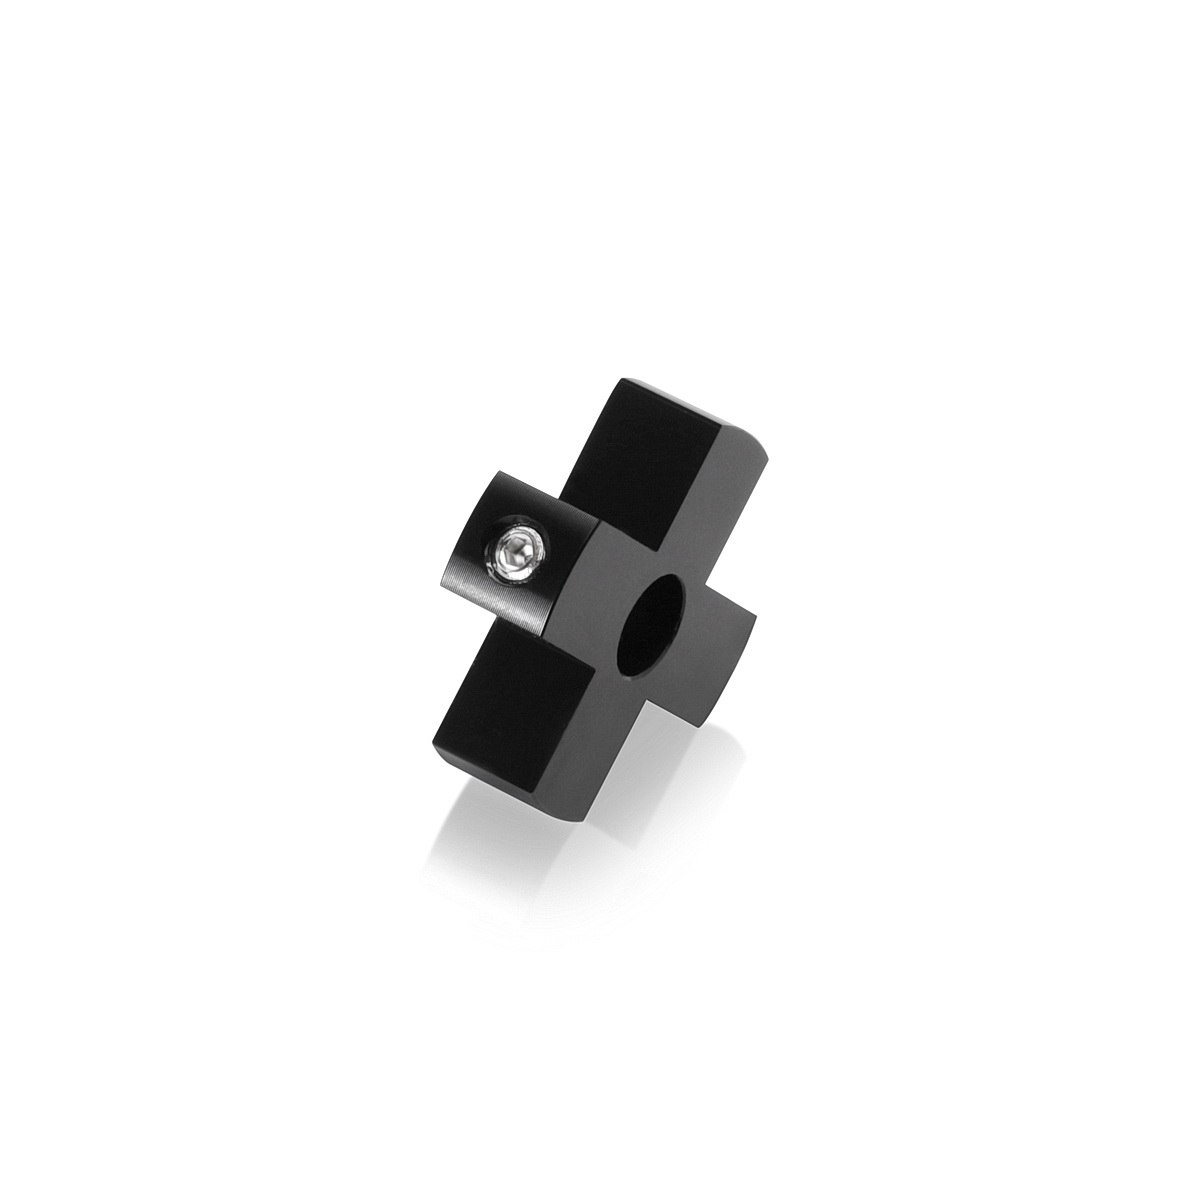 4-Way Standoffs Hub, Diameter: 1 1/4'', Thickness: 3/8'', Black Anodized Aluminum